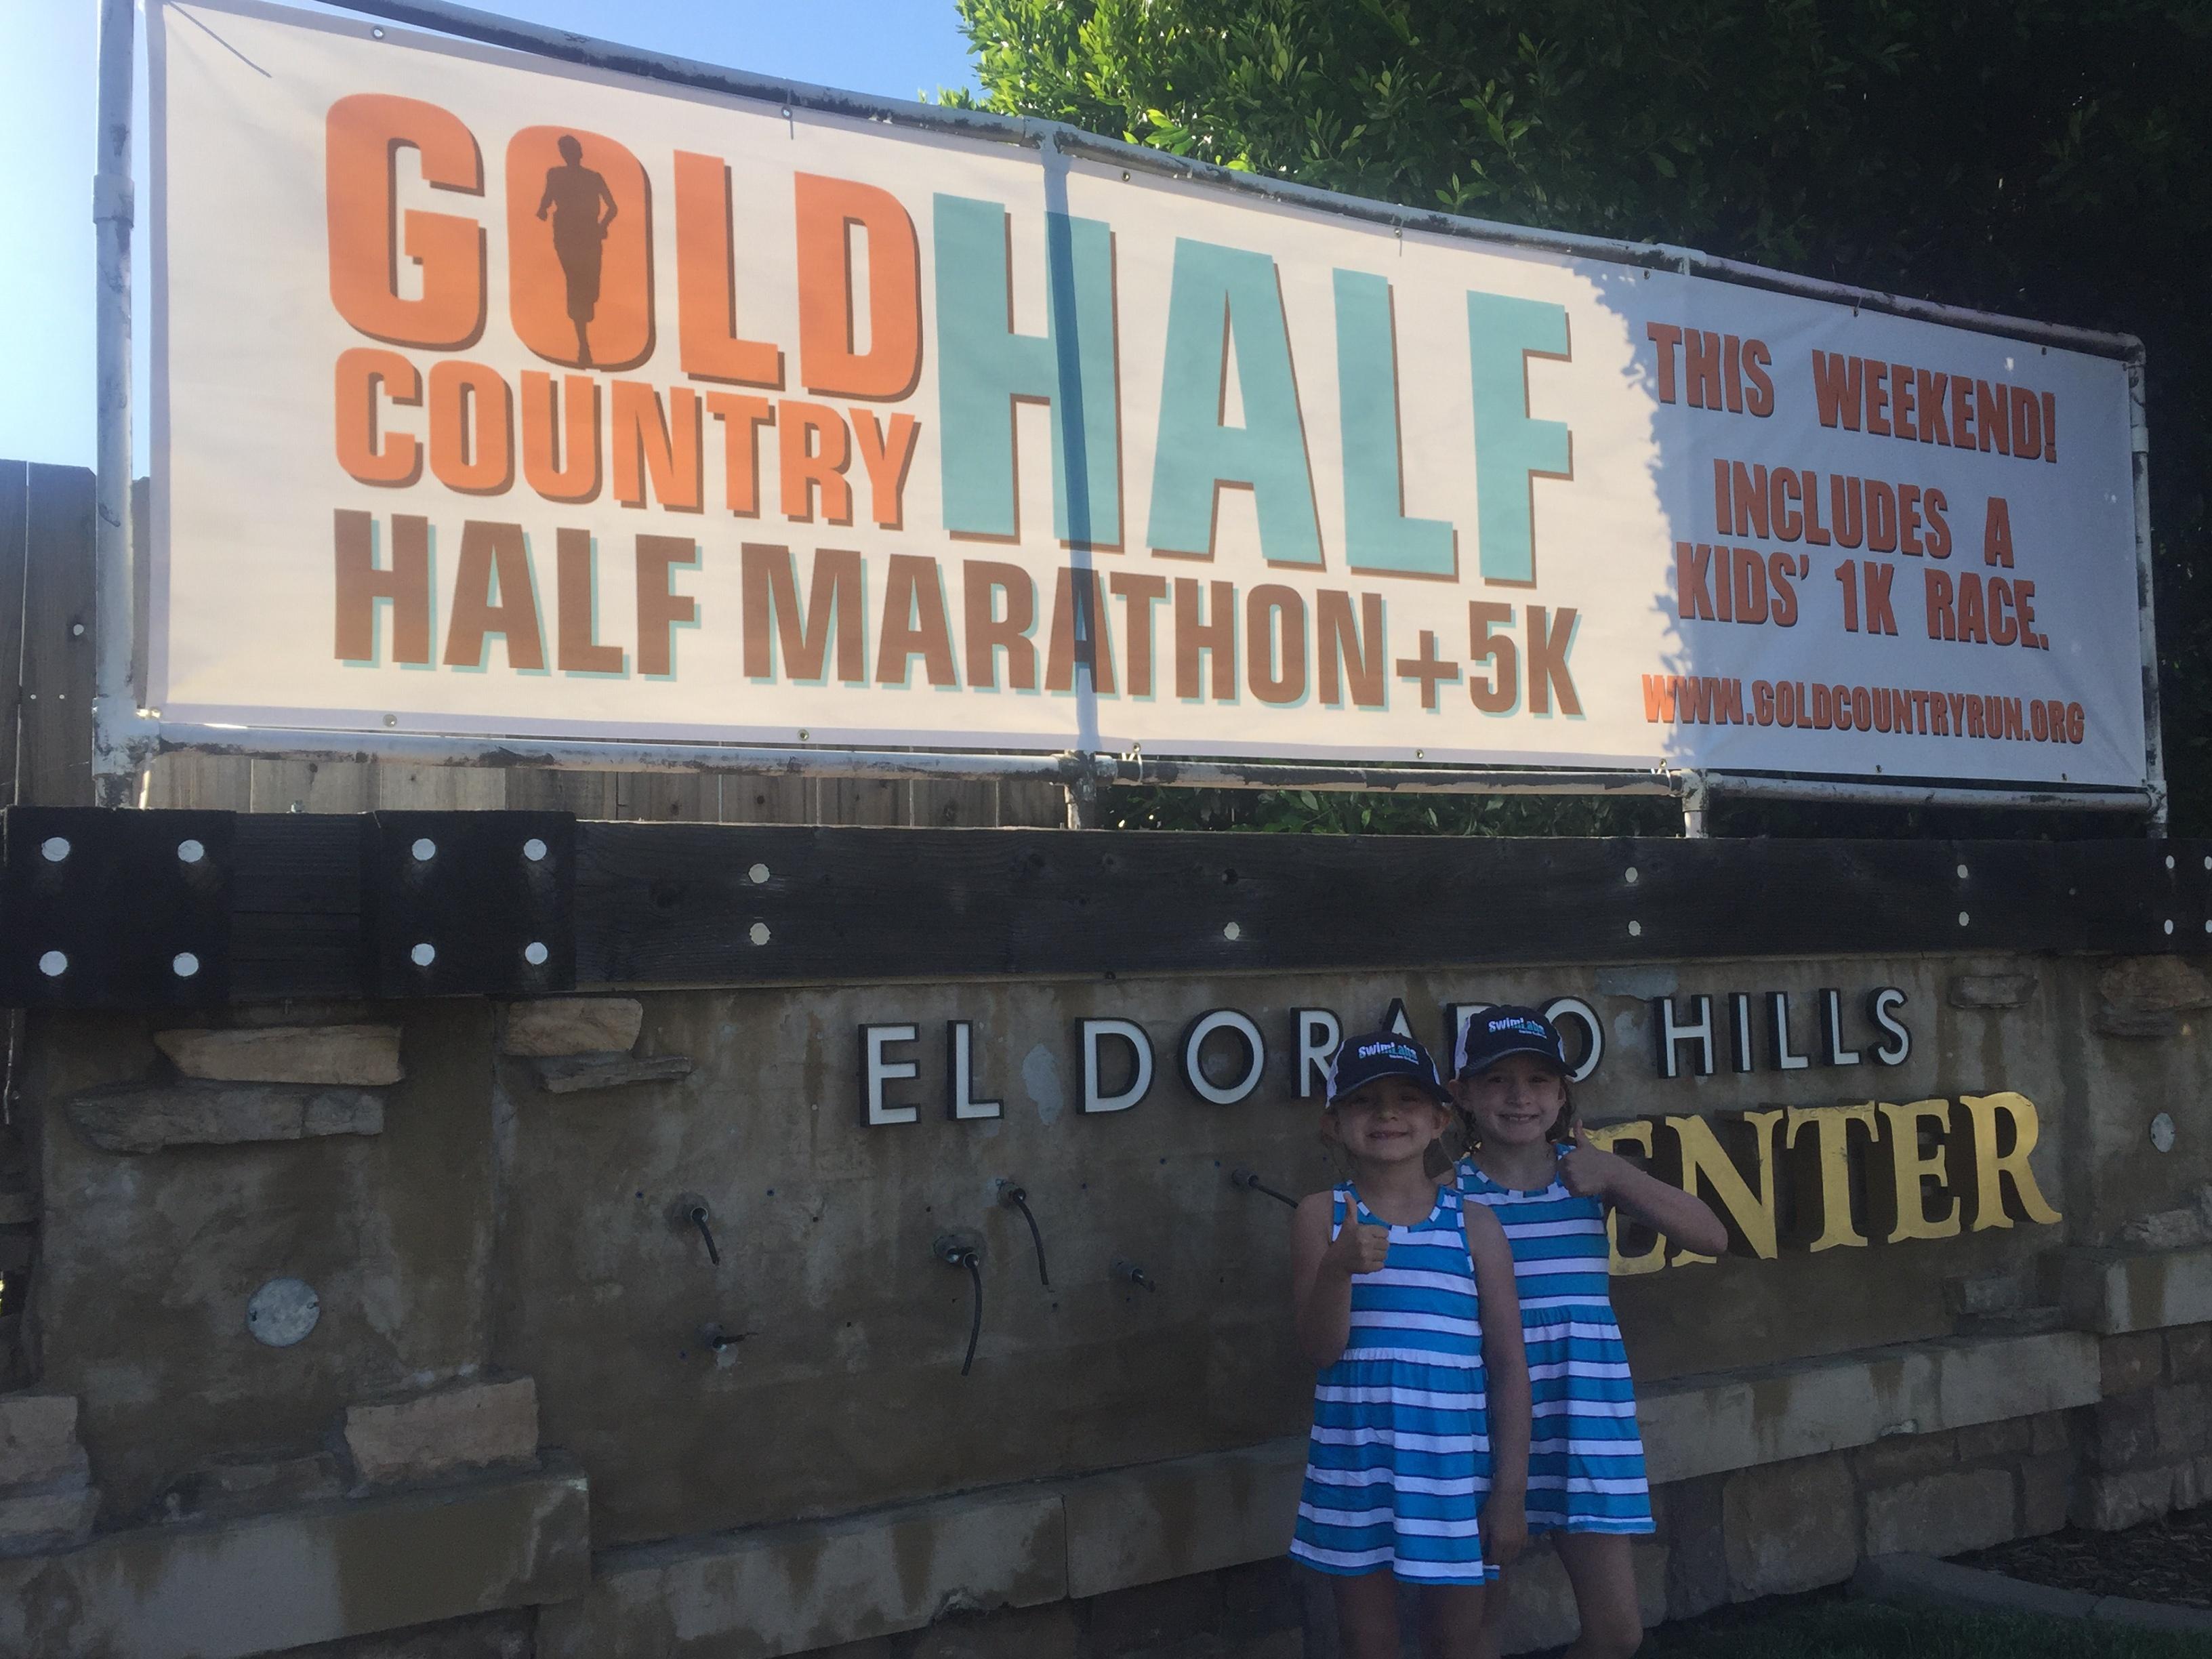 Gold County Half Marathon